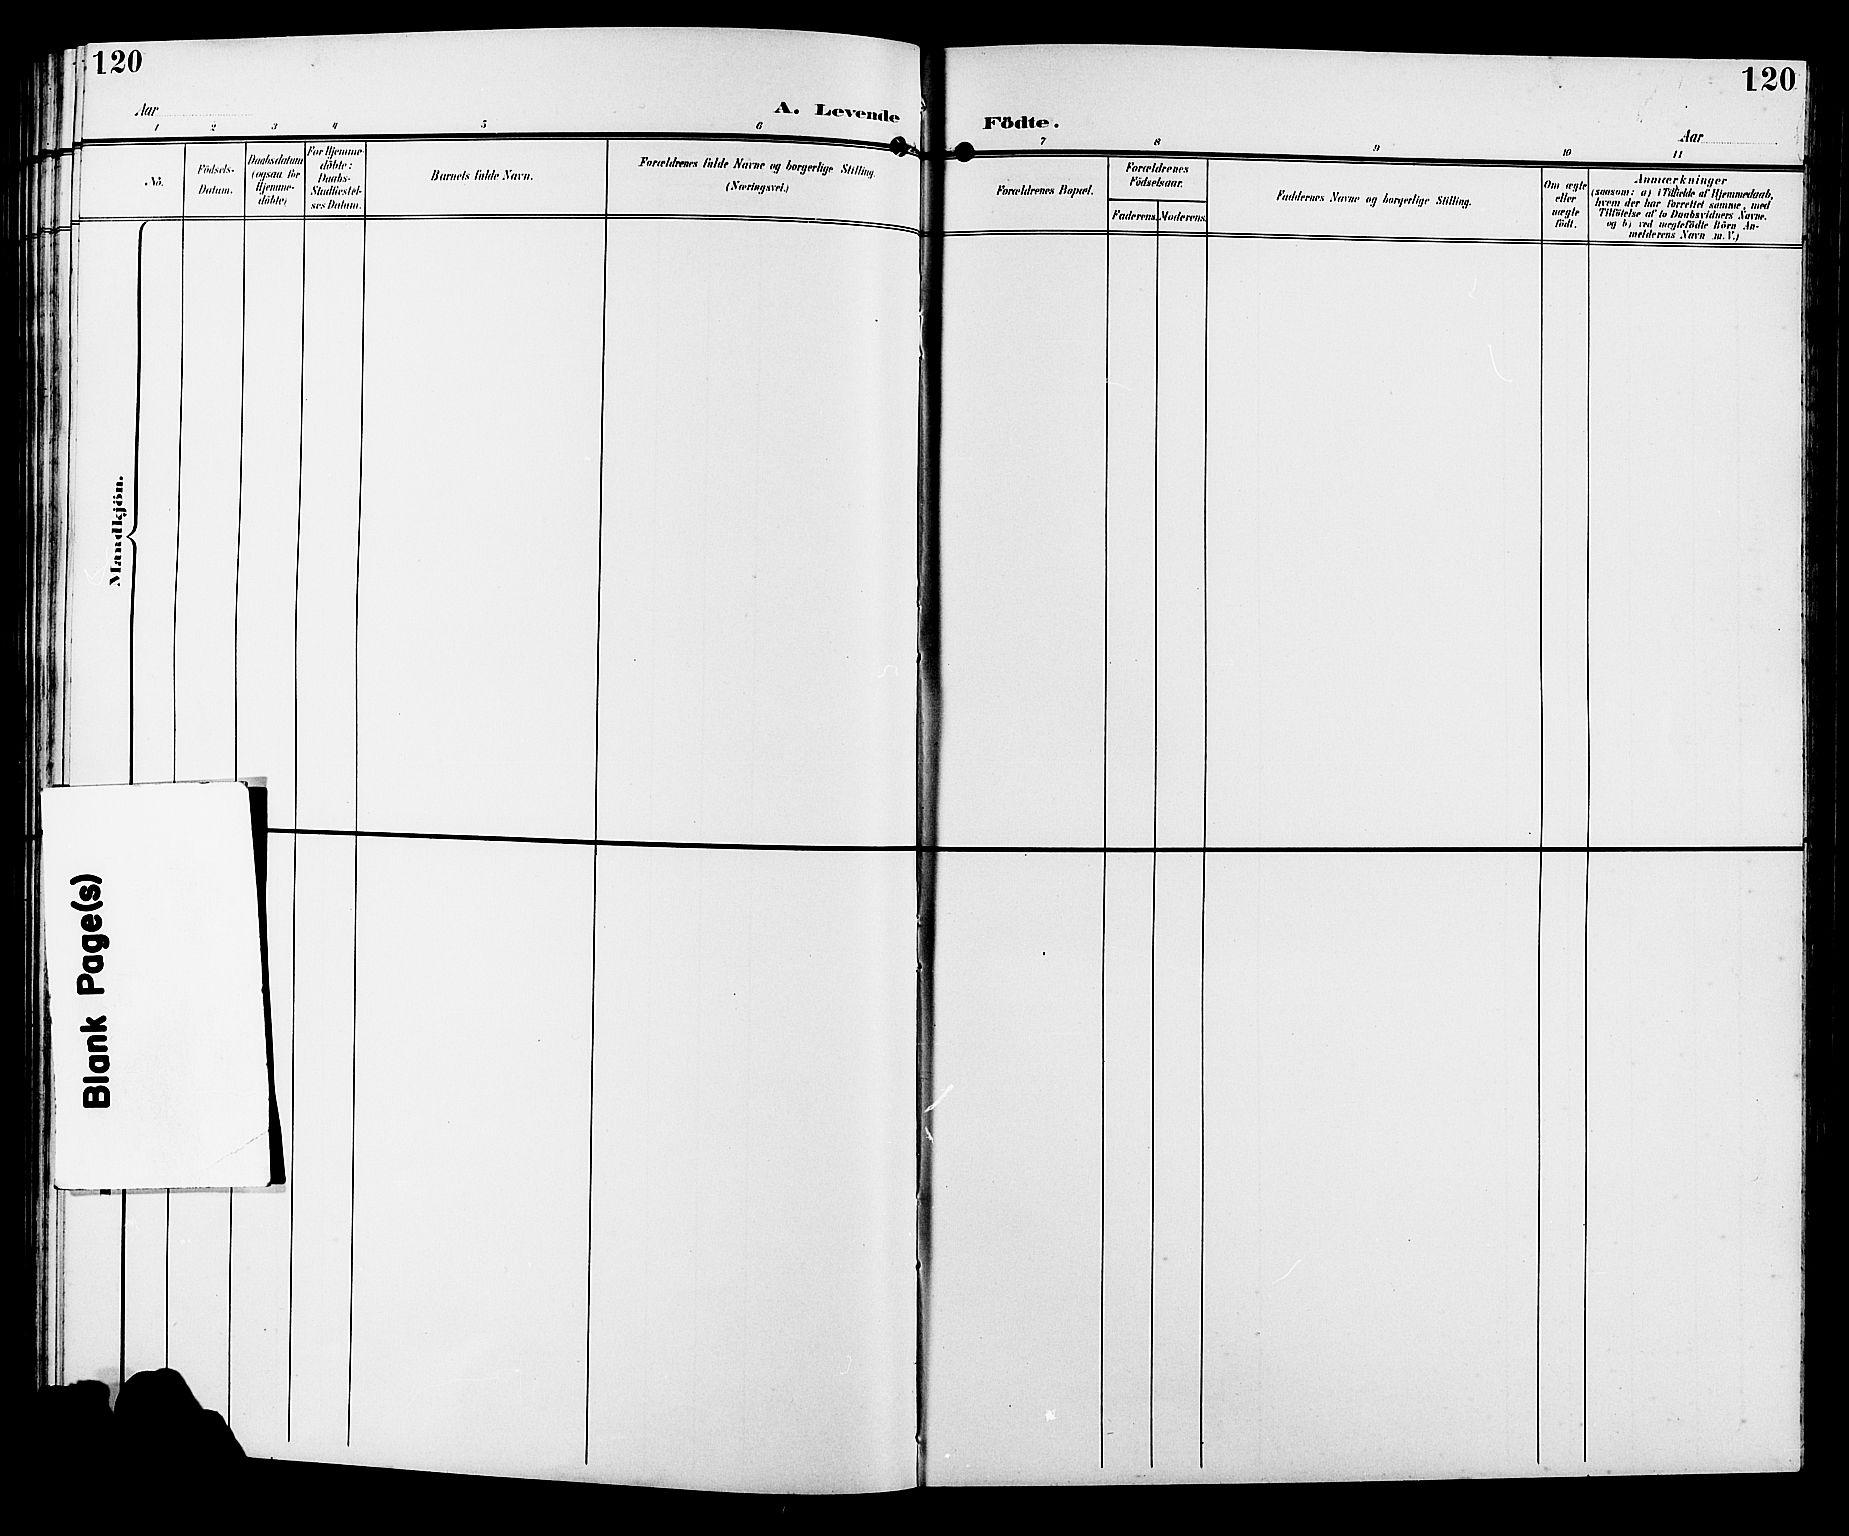 SAH, Sør-Fron prestekontor, H/Ha/Hab/L0004: Klokkerbok nr. 4, 1896-1911, s. 120